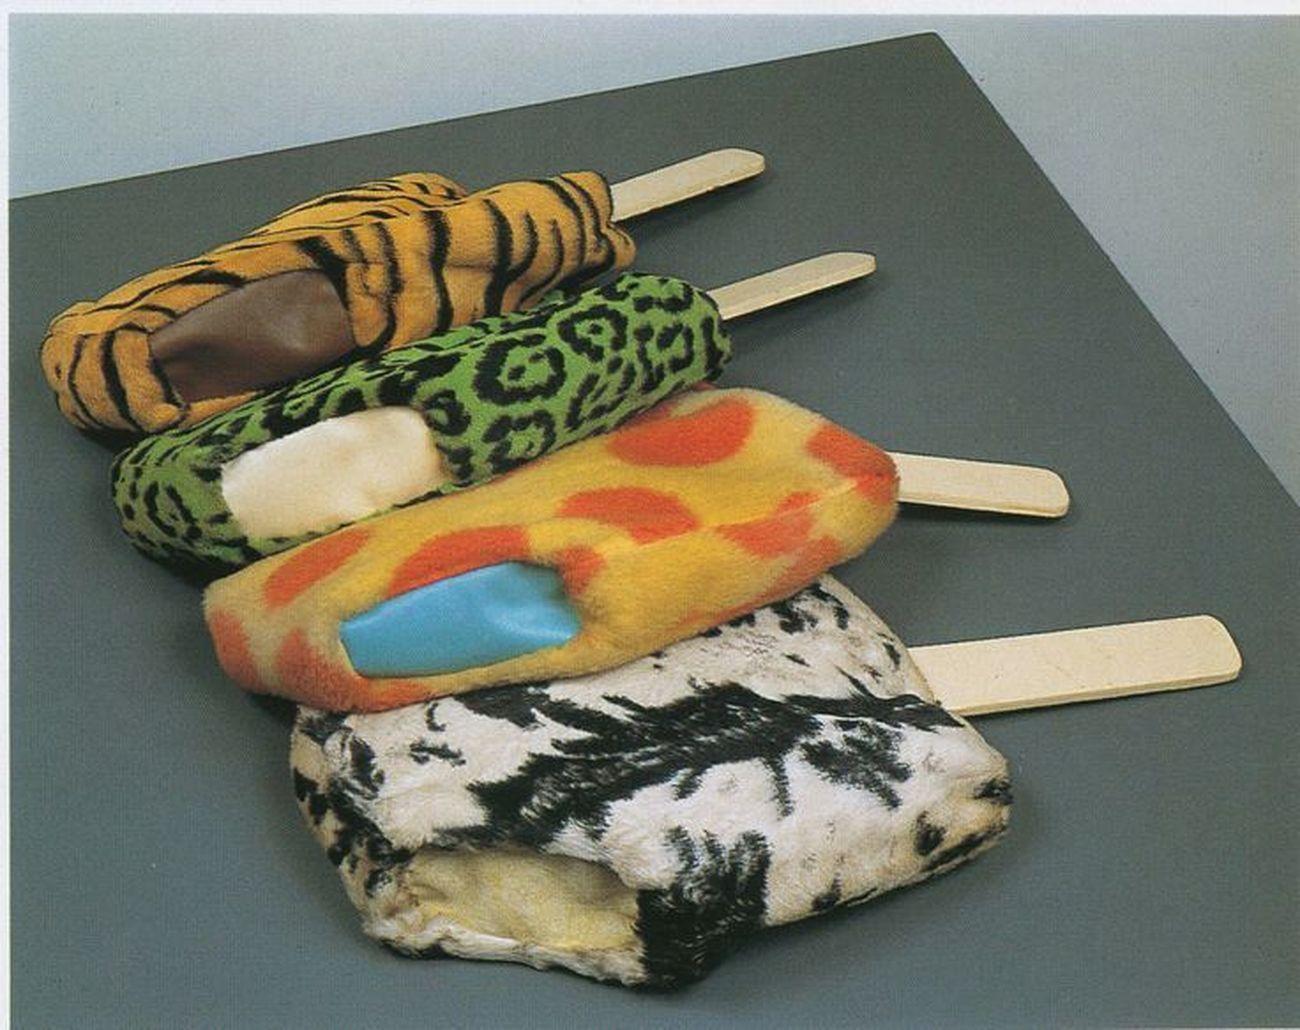 Claes Oldenburg, Soft Fur Good Humors, 1963